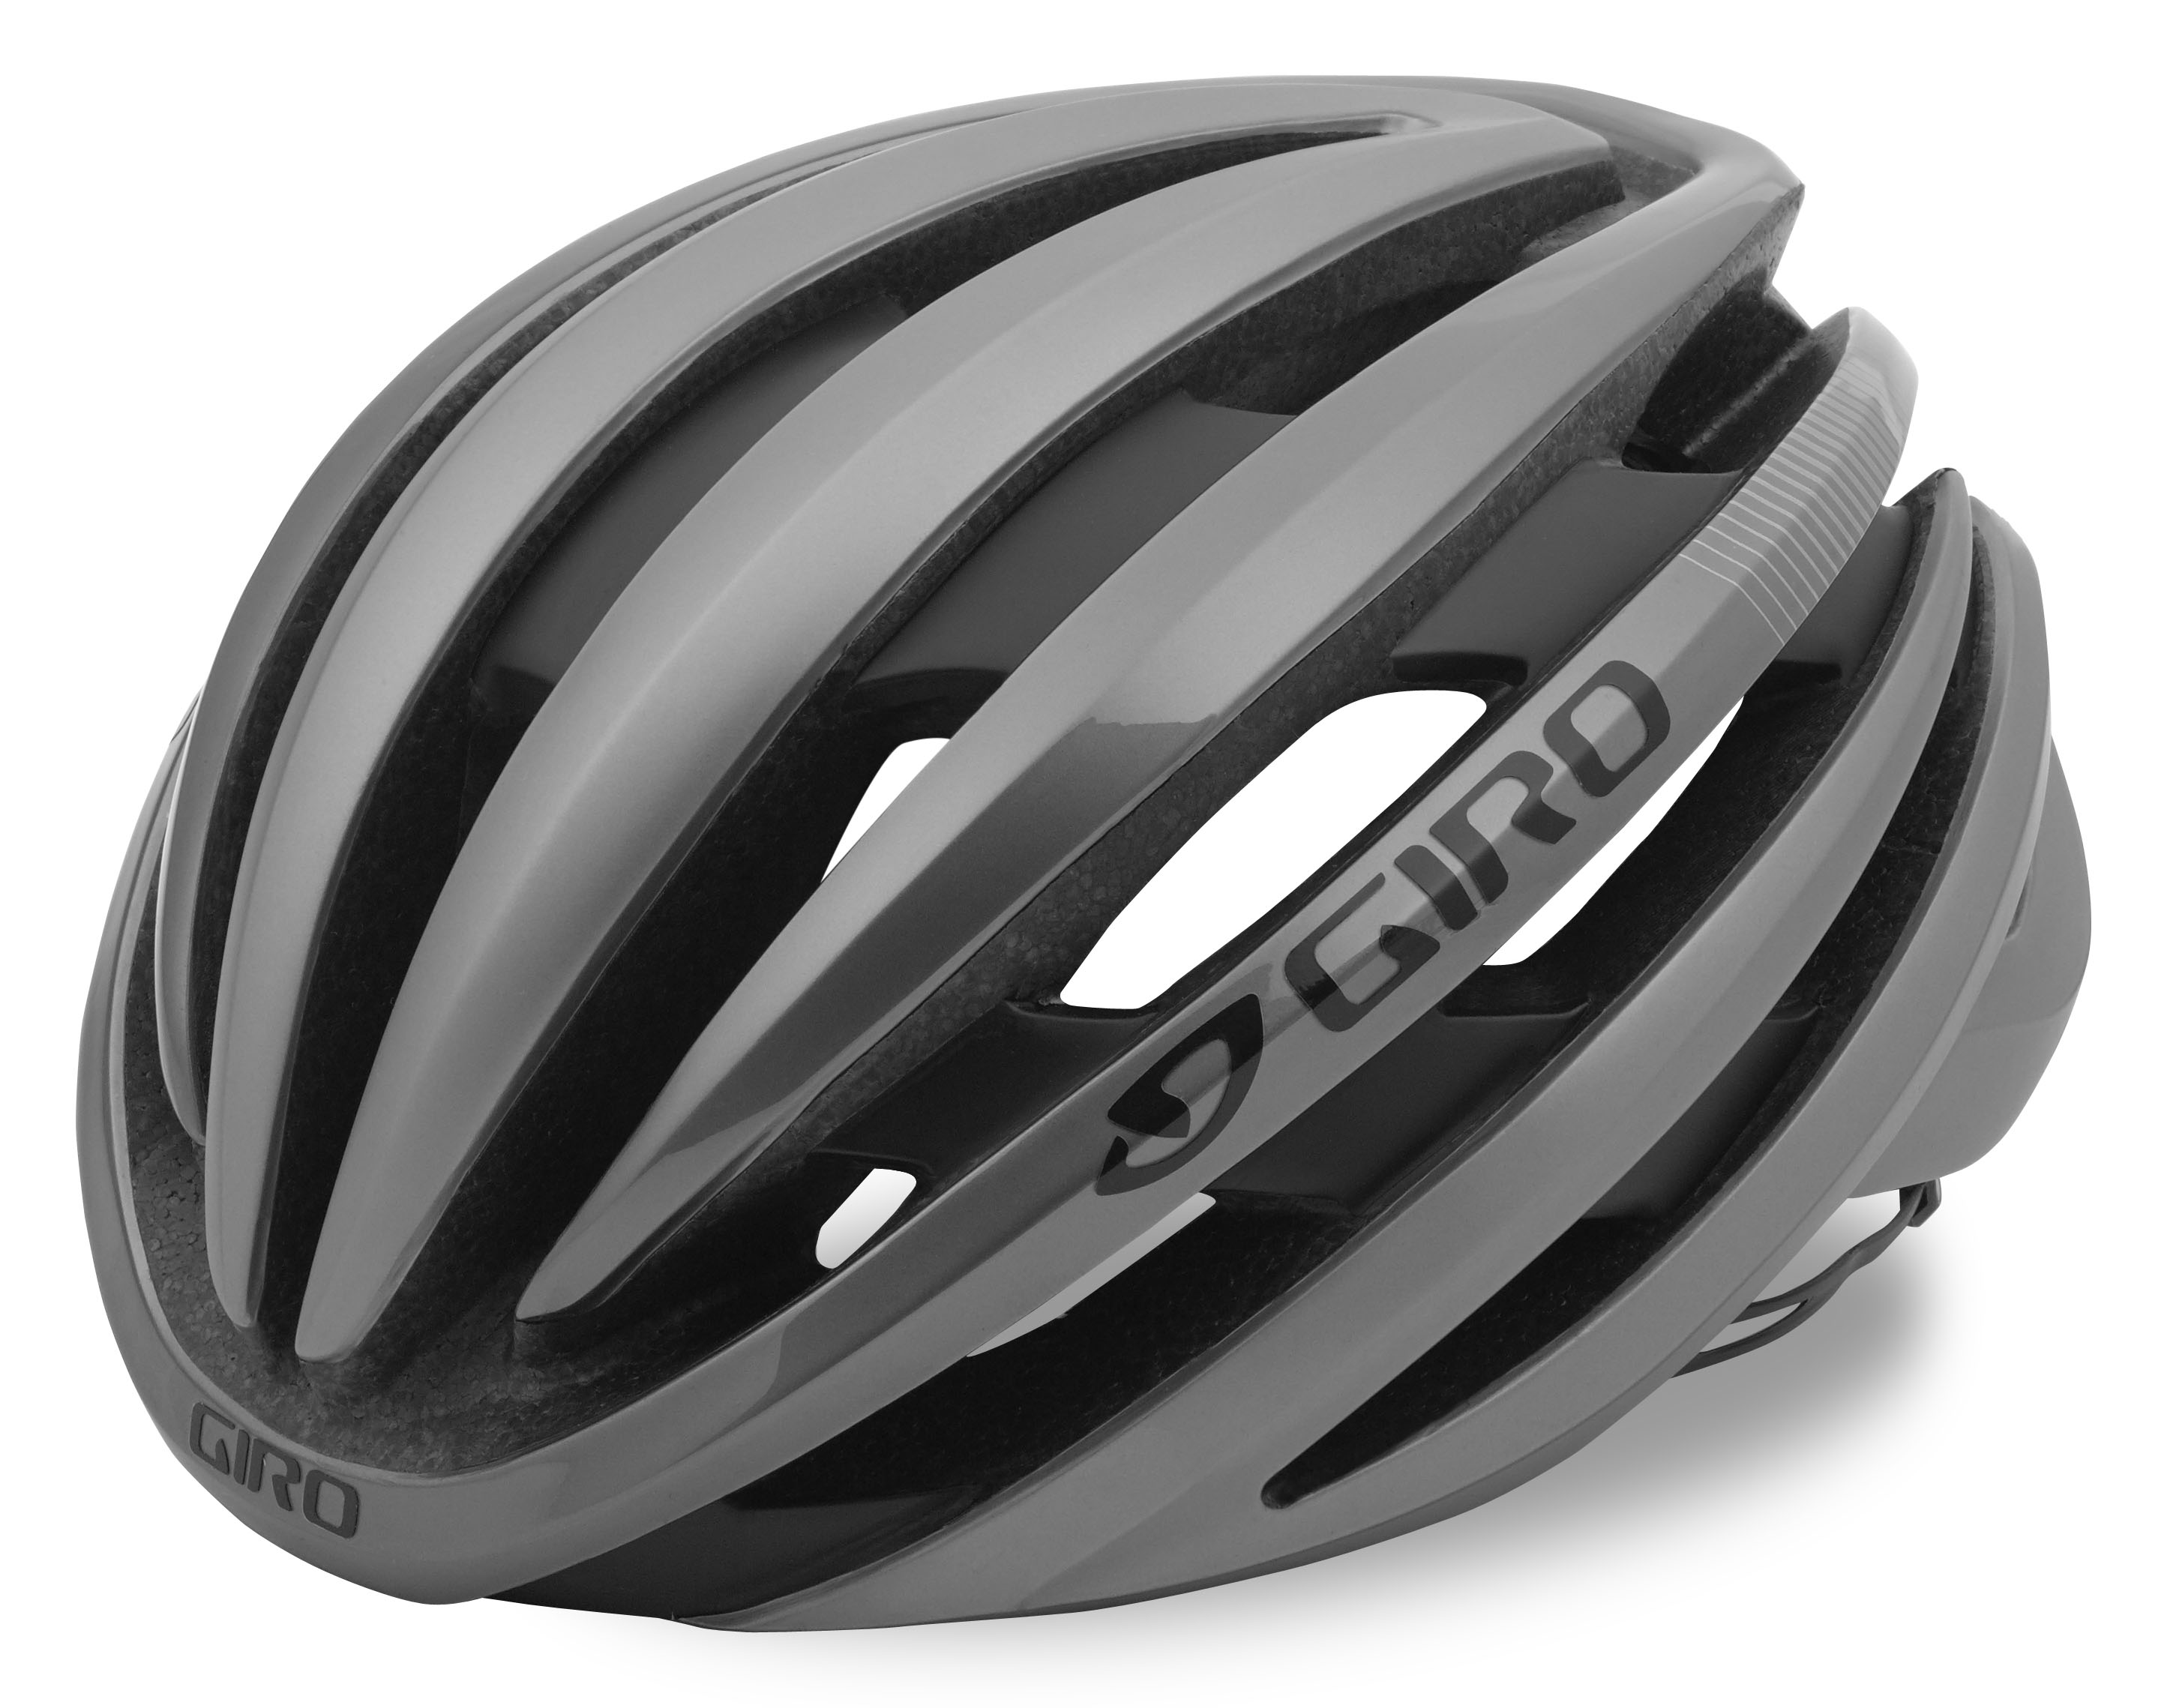 Giro cykelhjelm Cinder Mips Mat Ti L Mat Titanium TITAN L/59-63cm | Hjelme